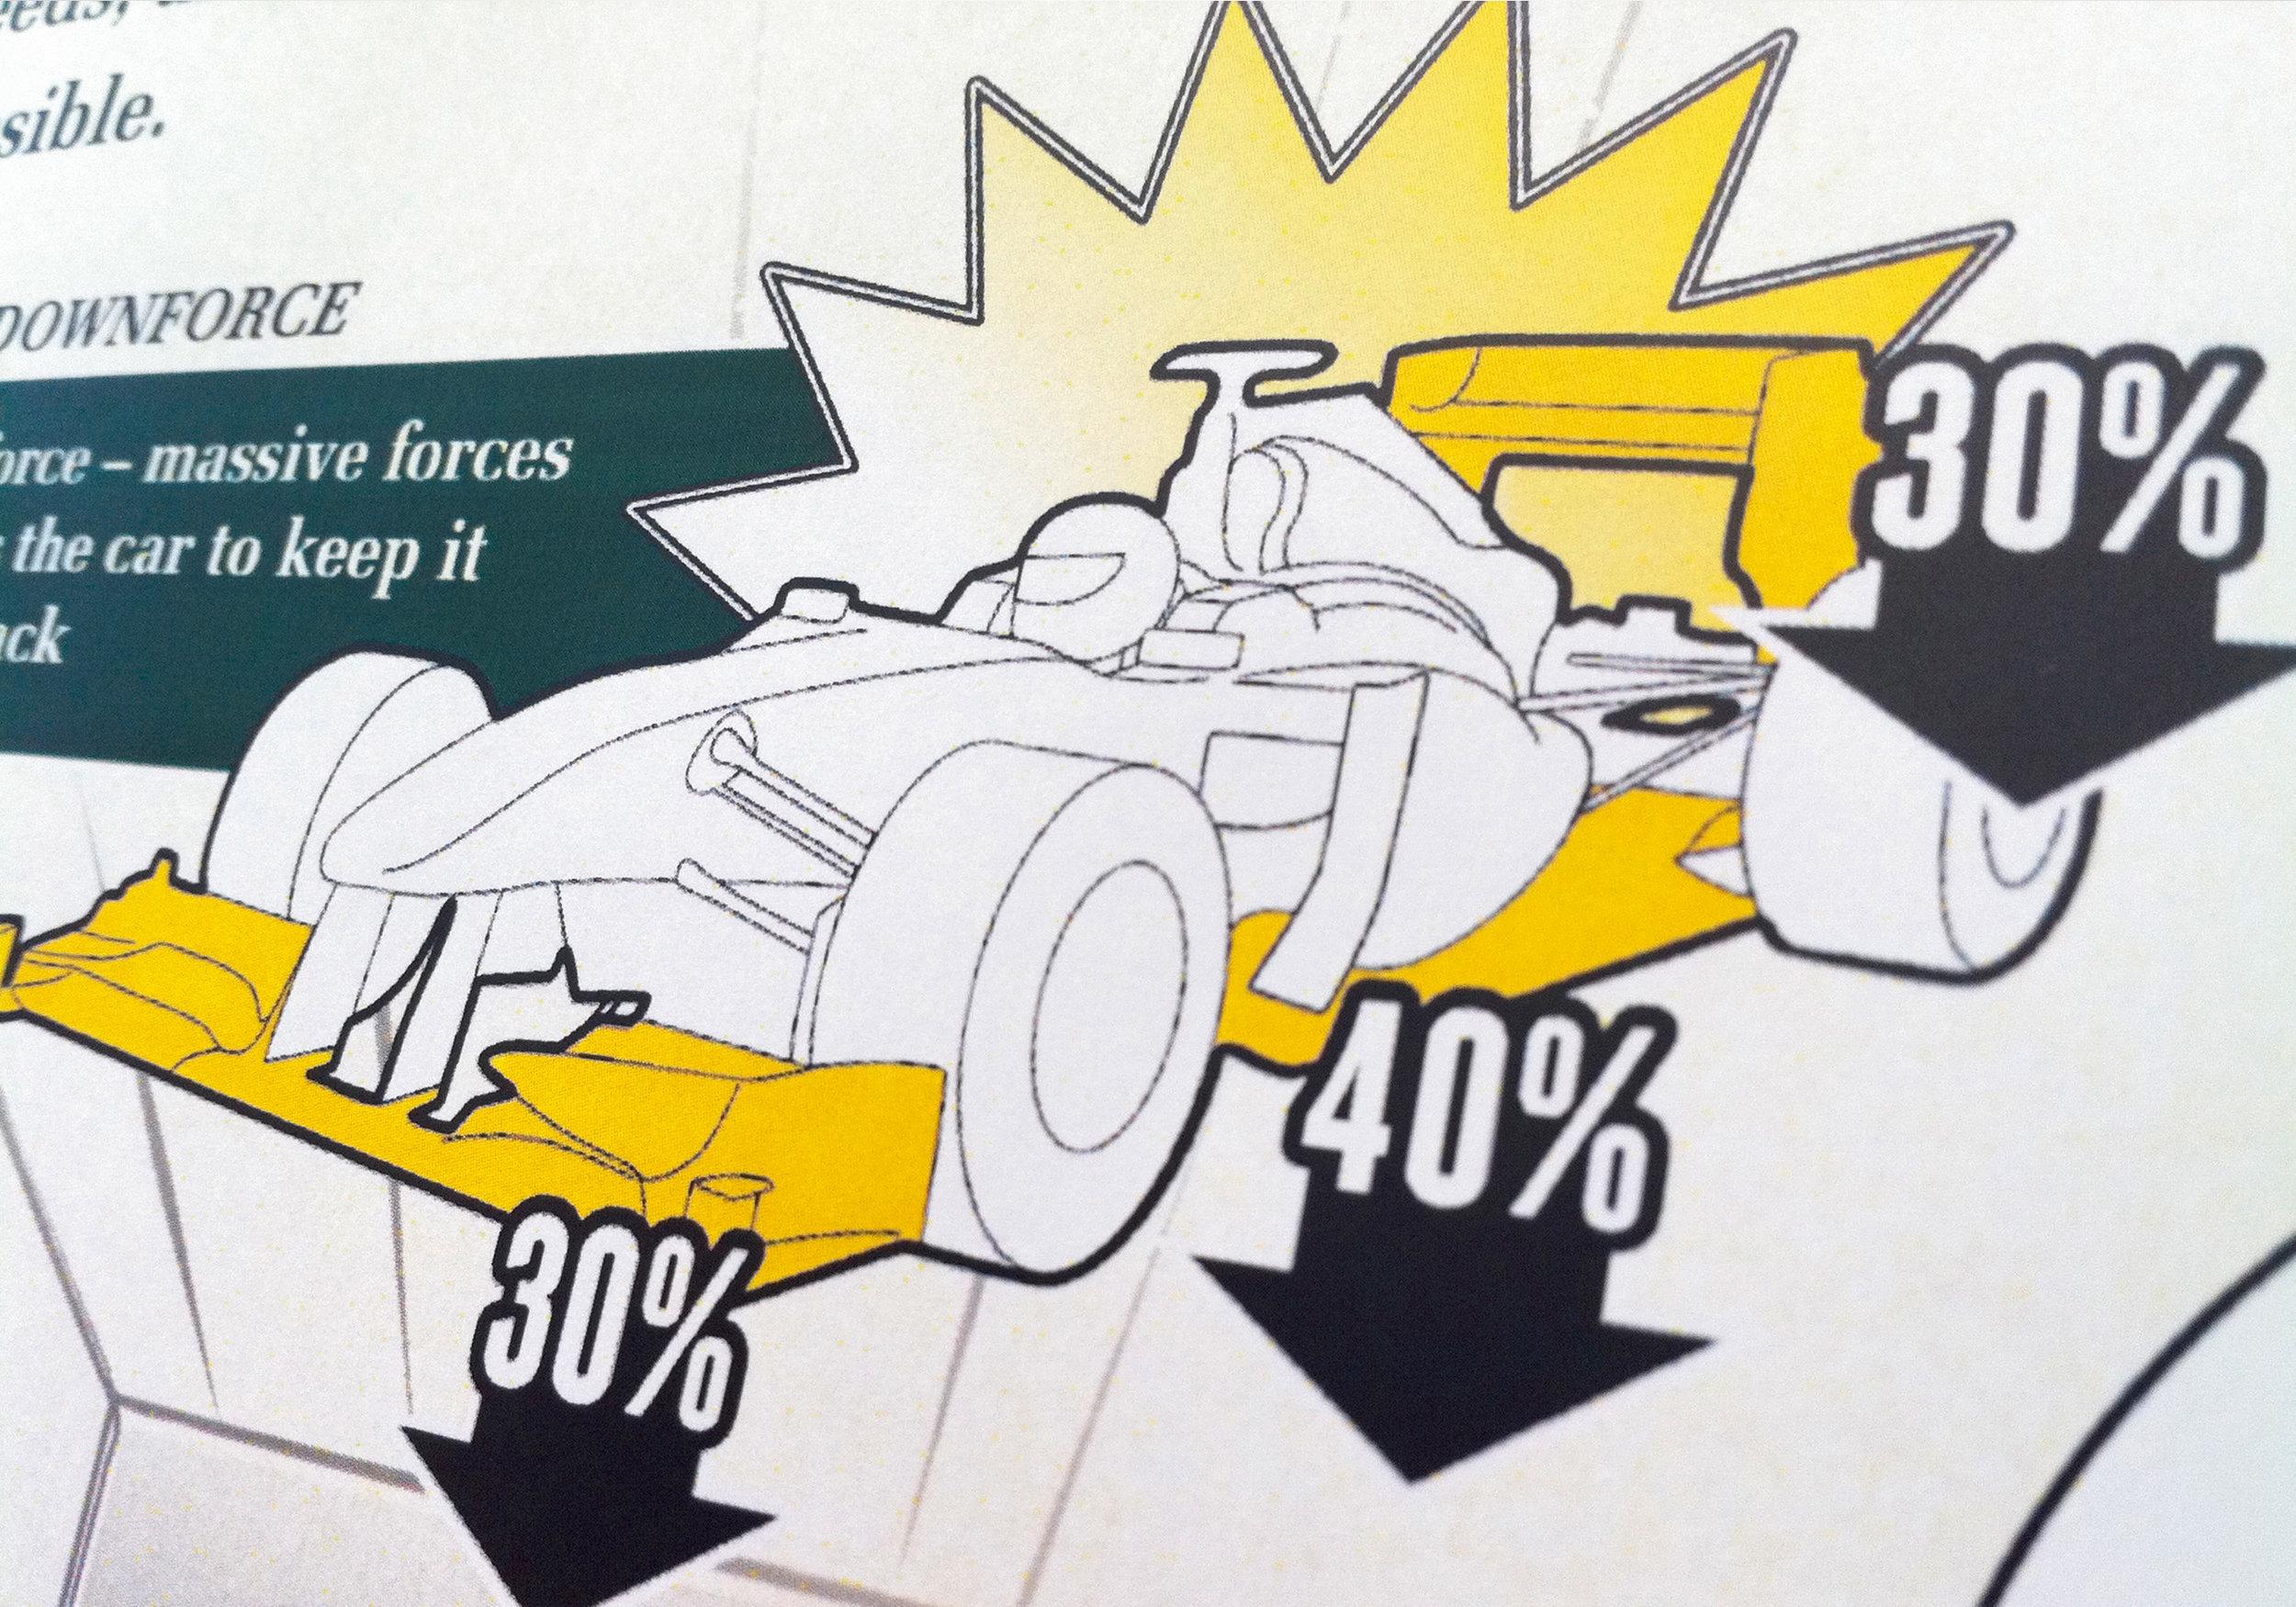 06_Josekdesign_Team_Lotus.jpg